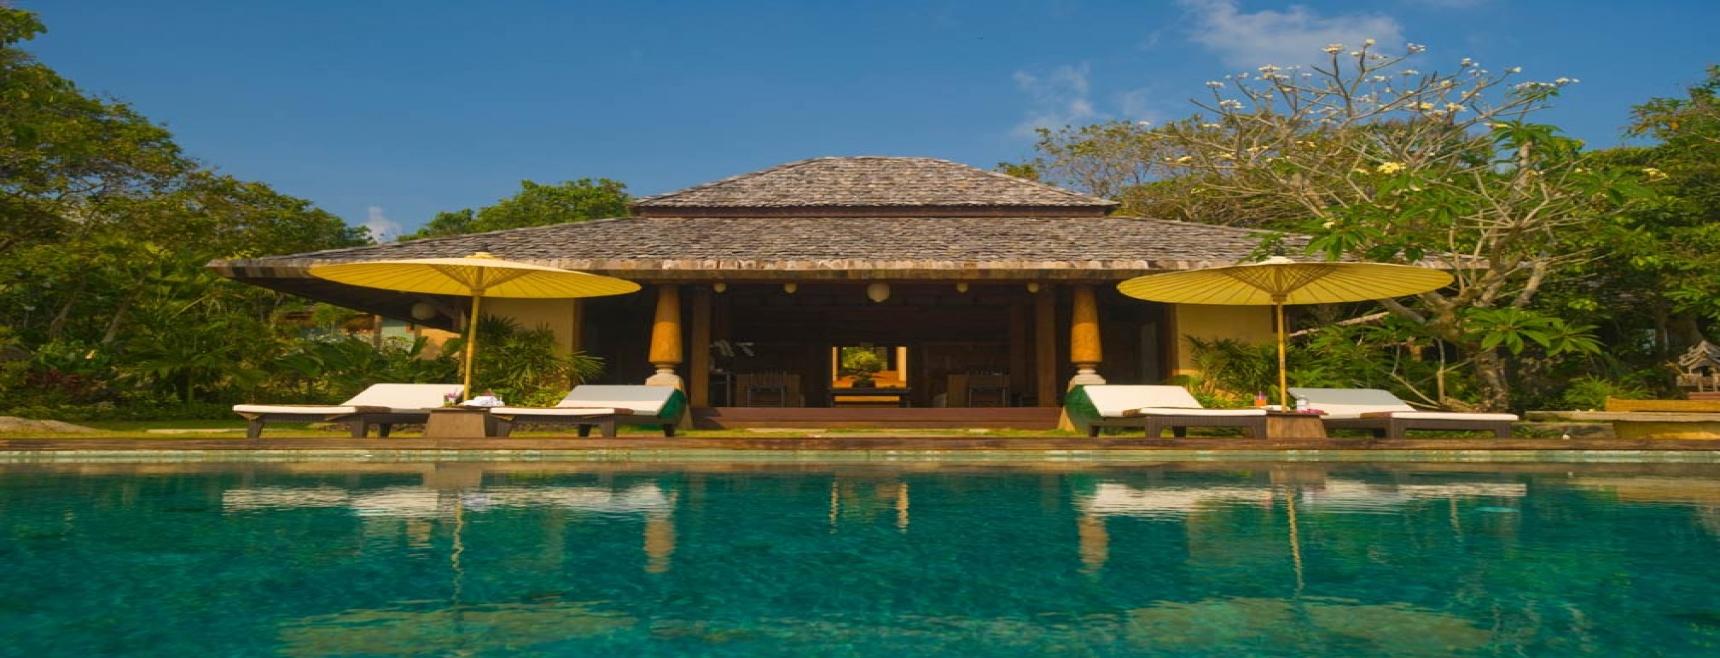 7 Bedrooms, Villa, Residential Sales, 7 Bathrooms, Listing ID 1057, Laem Set, South East, Koh Samui,